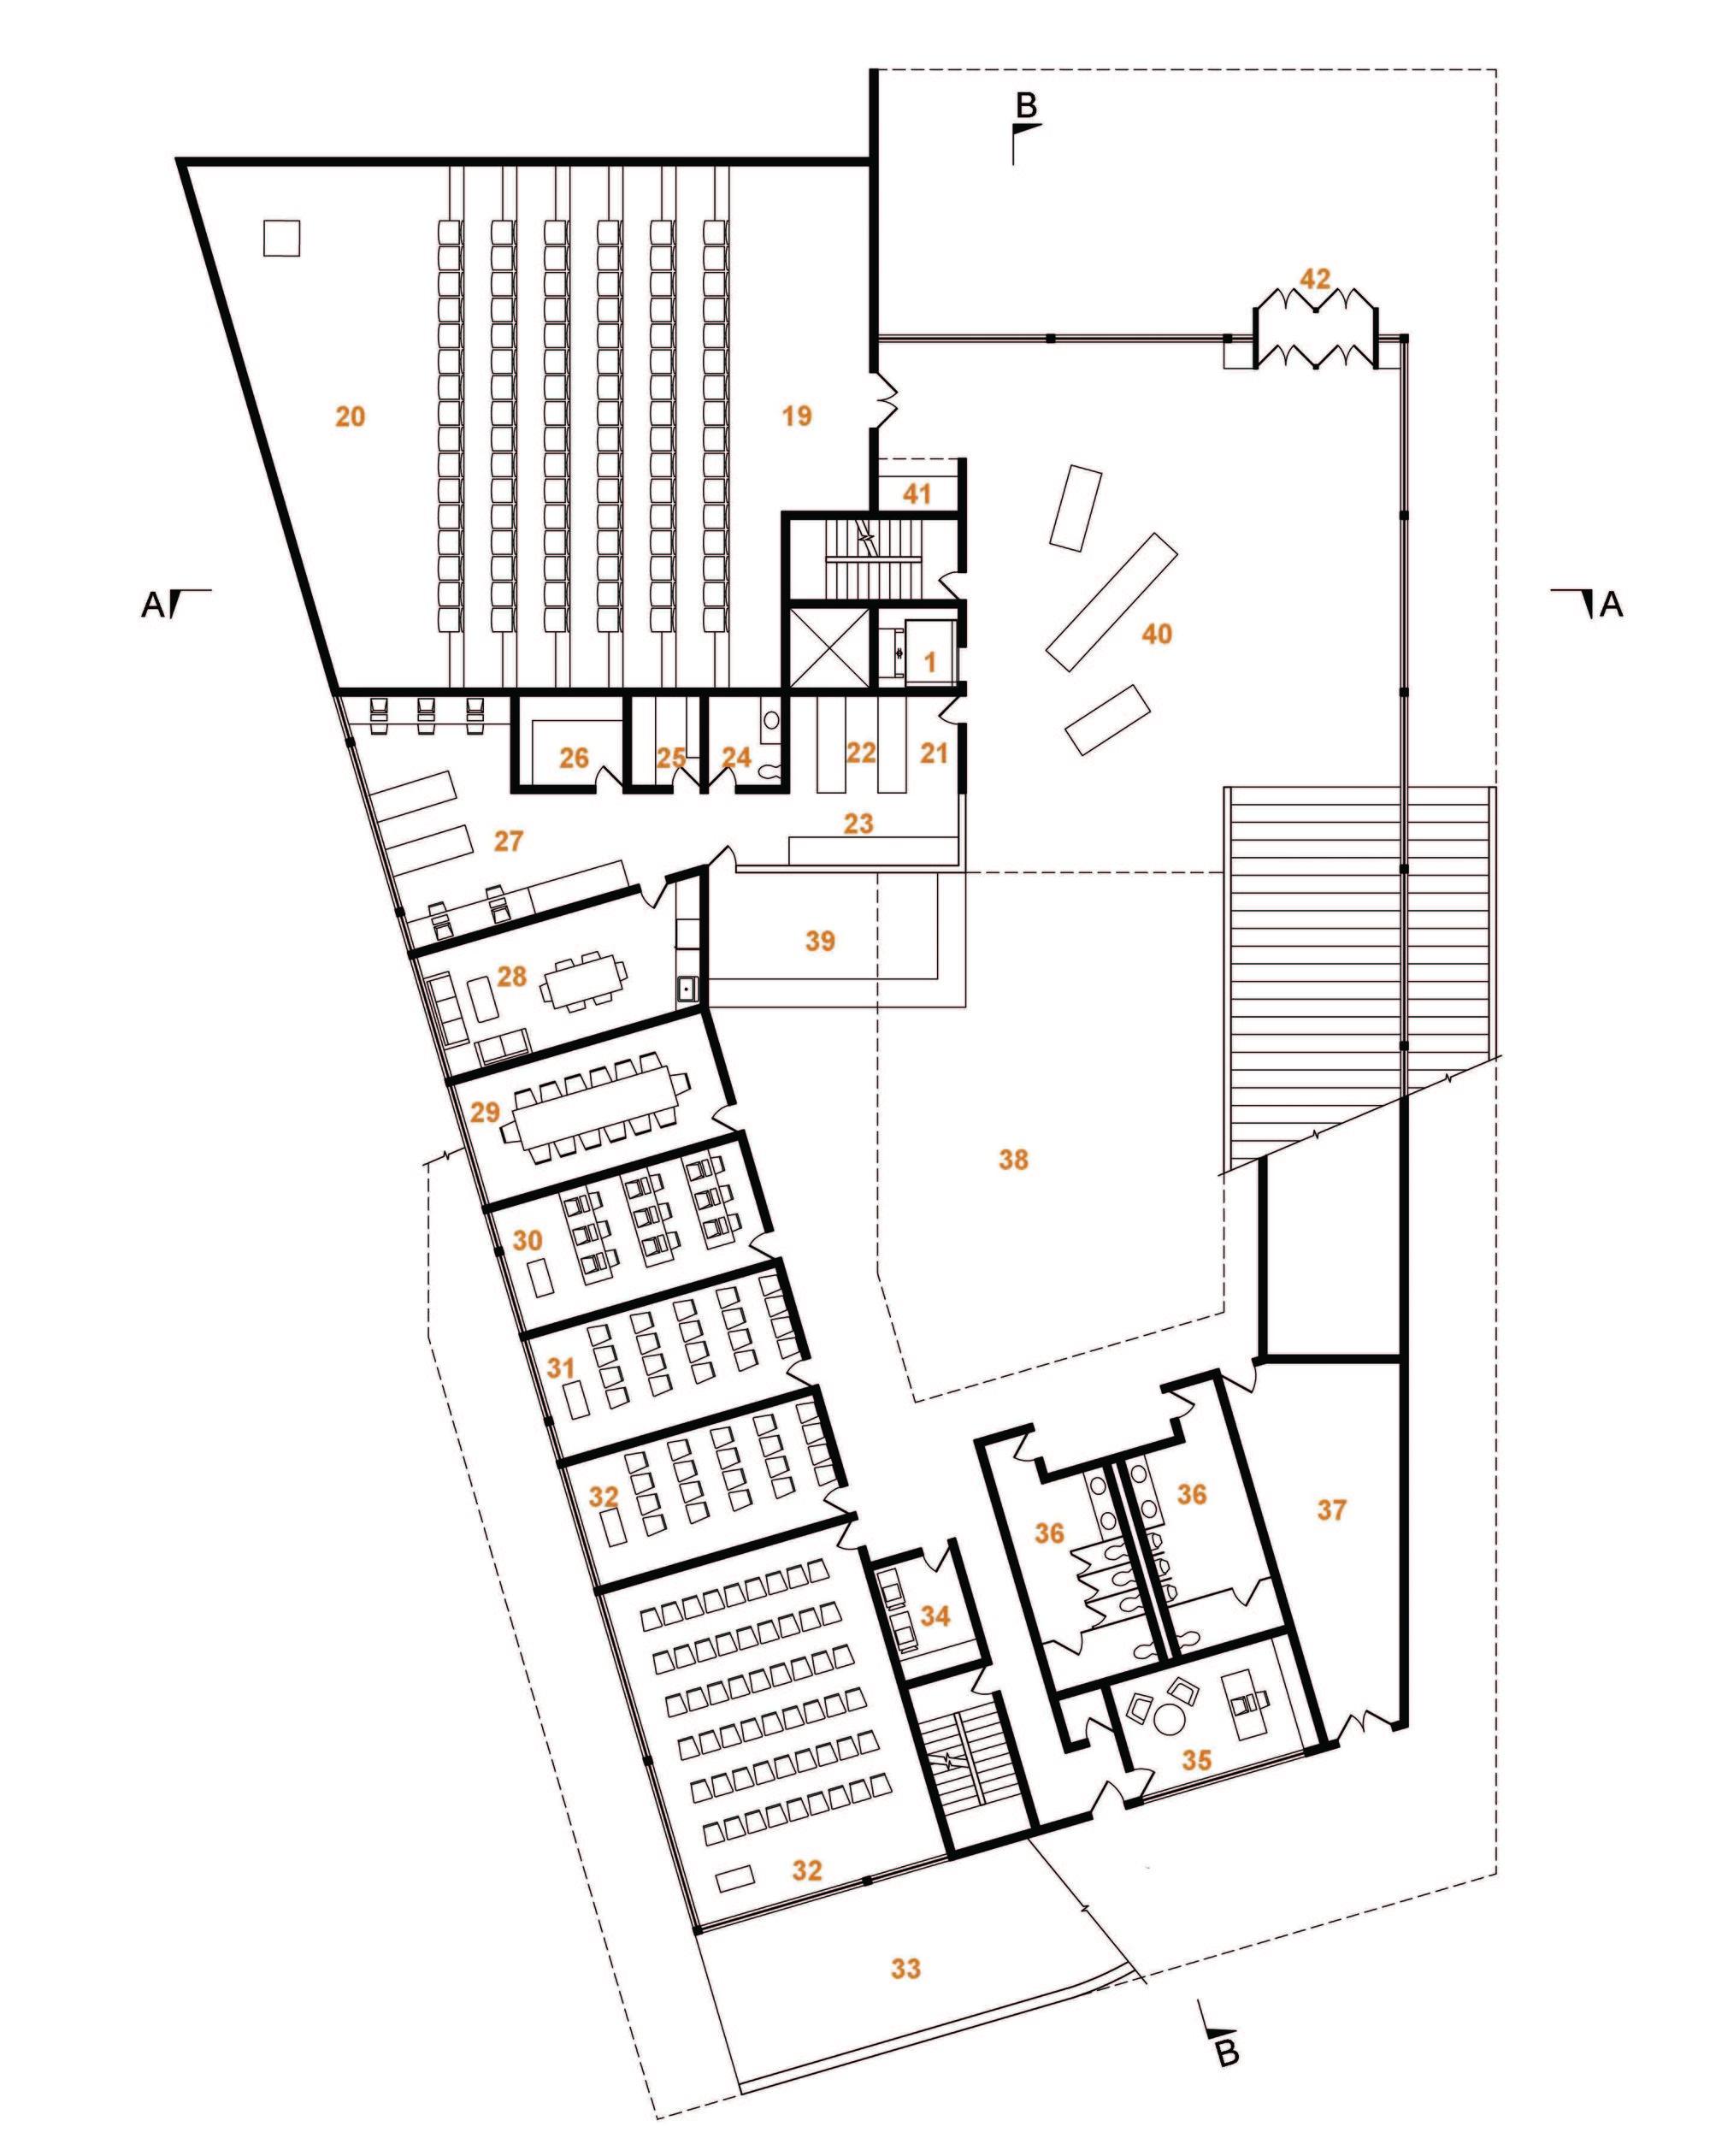 Gallery Of Daegu Gosan Public Library Competition Entry Martin Fenlon Architecture 14